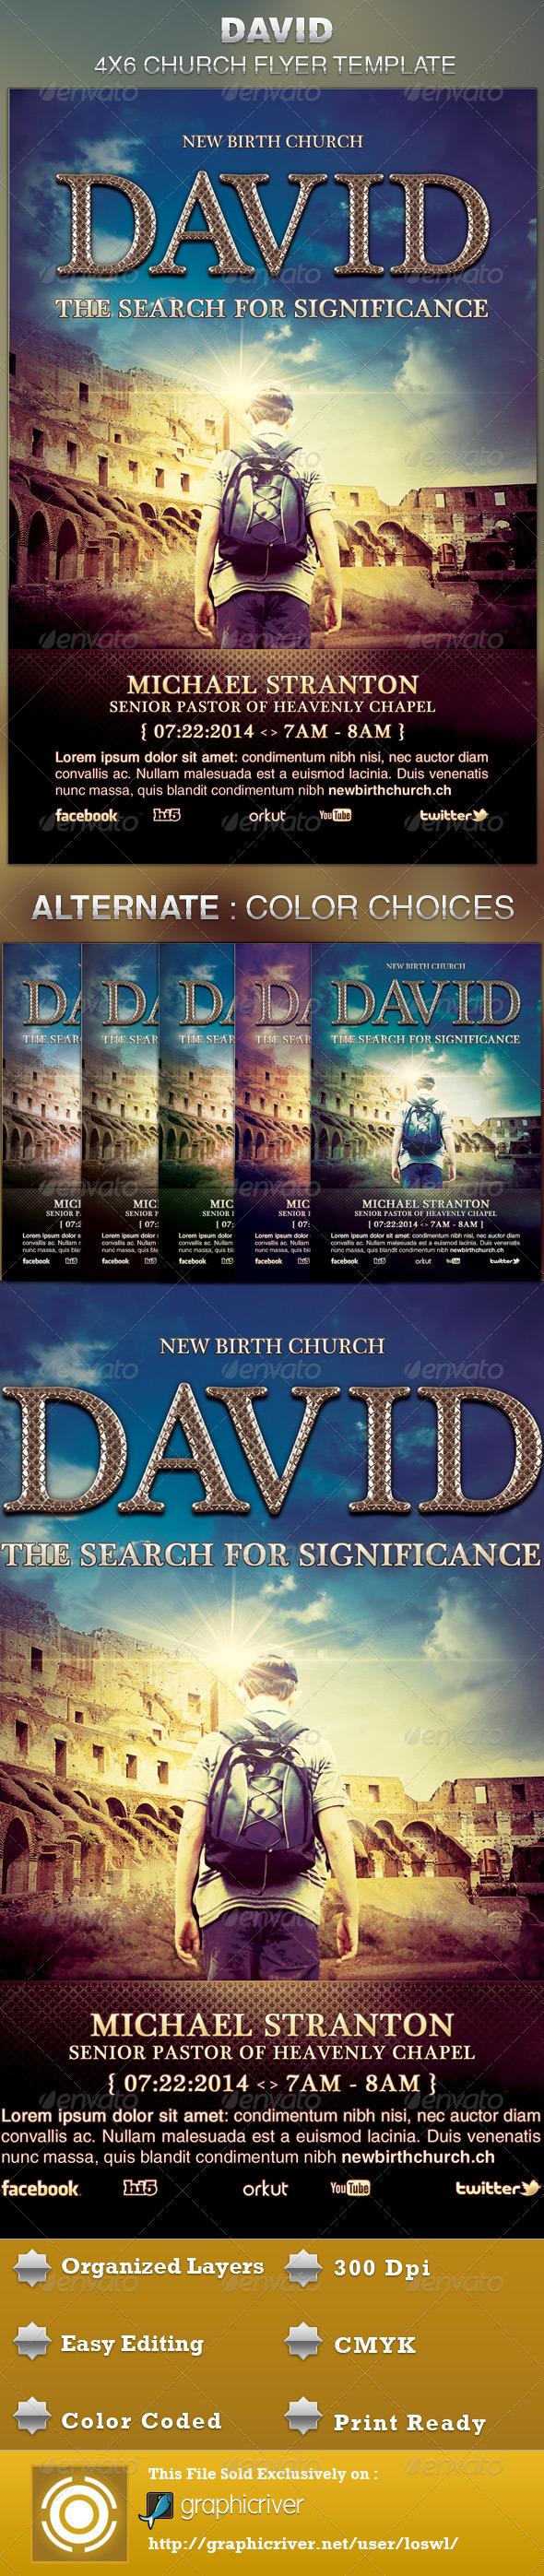 David Church Flyer Template - Church Flyers